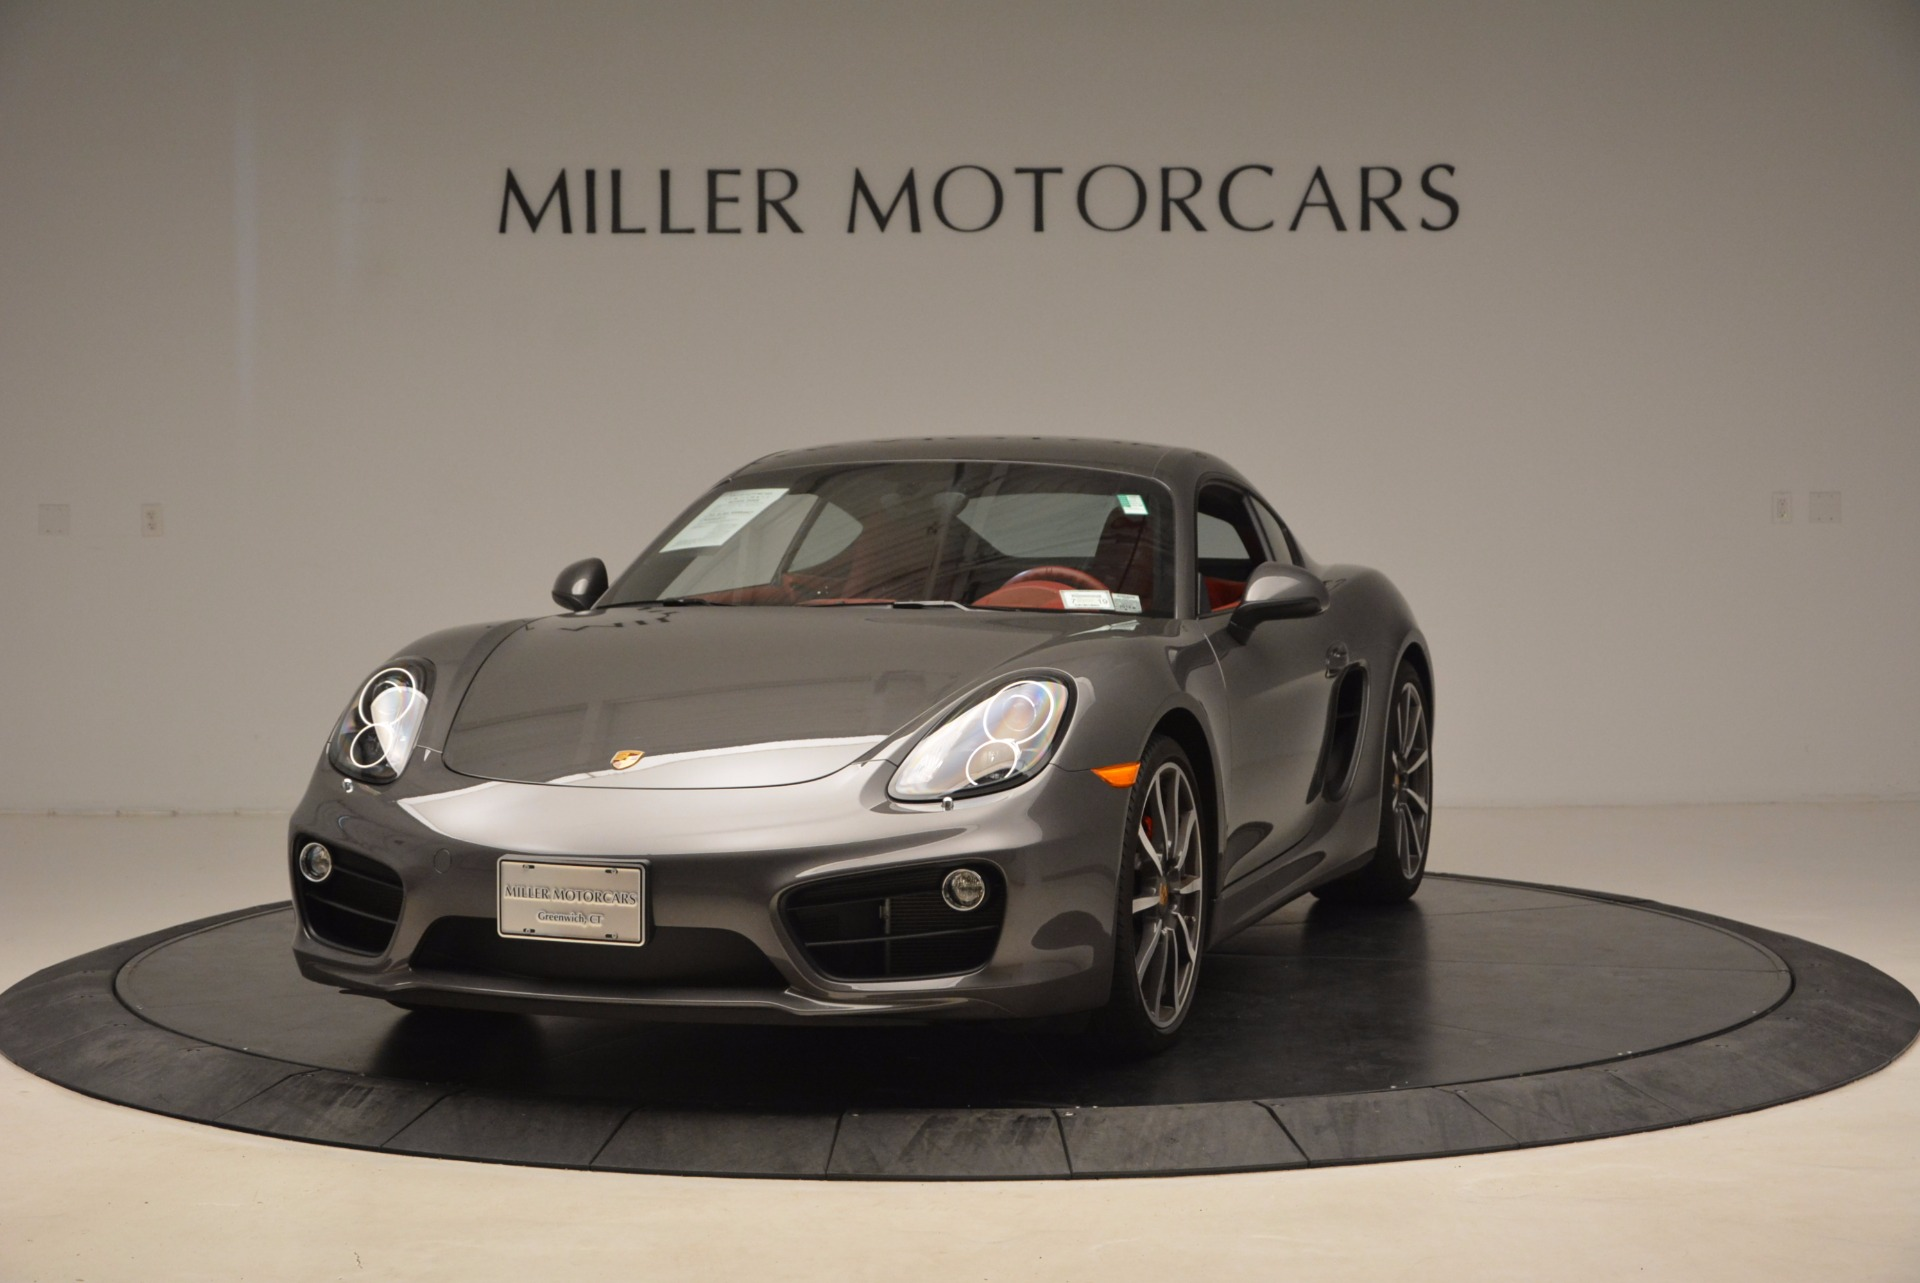 Used 2014 Porsche Cayman S S for sale Sold at Alfa Romeo of Westport in Westport CT 06880 1